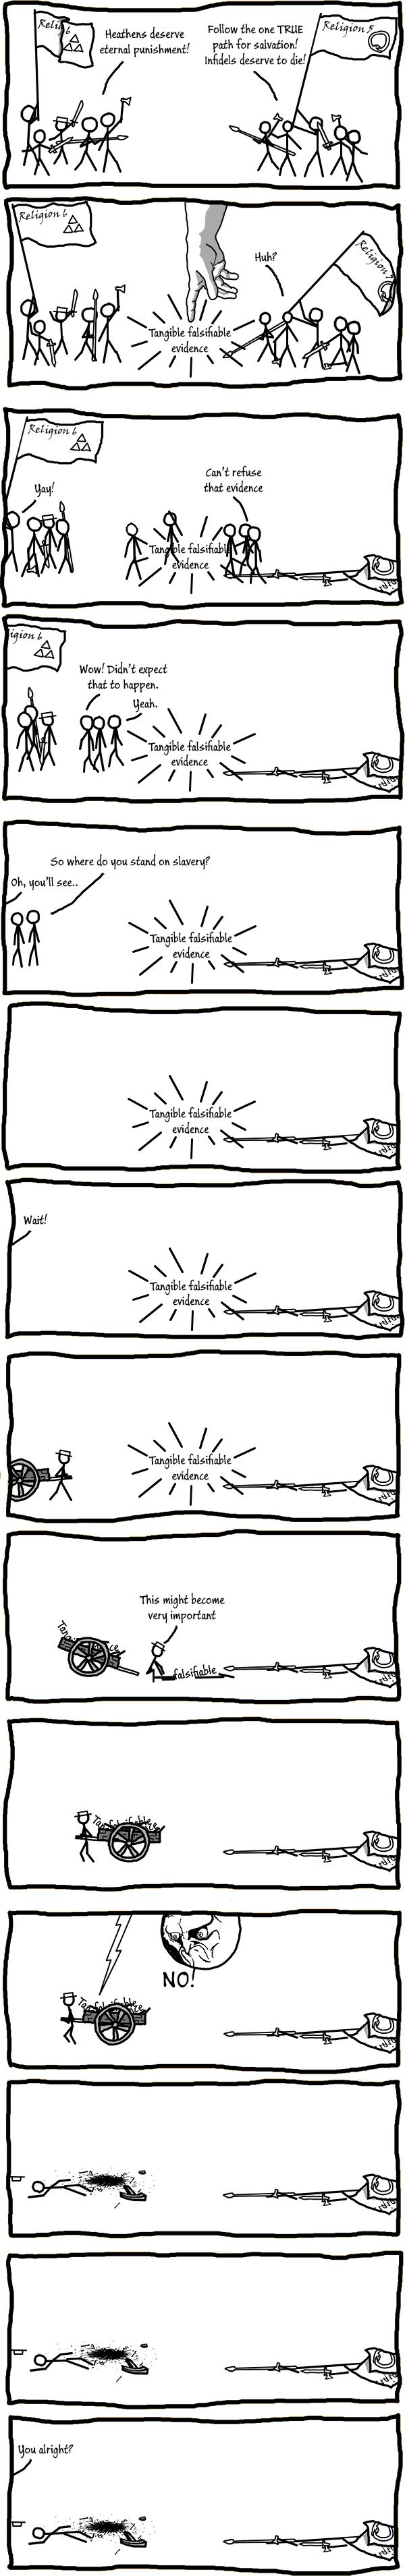 Comic-MyEvidence